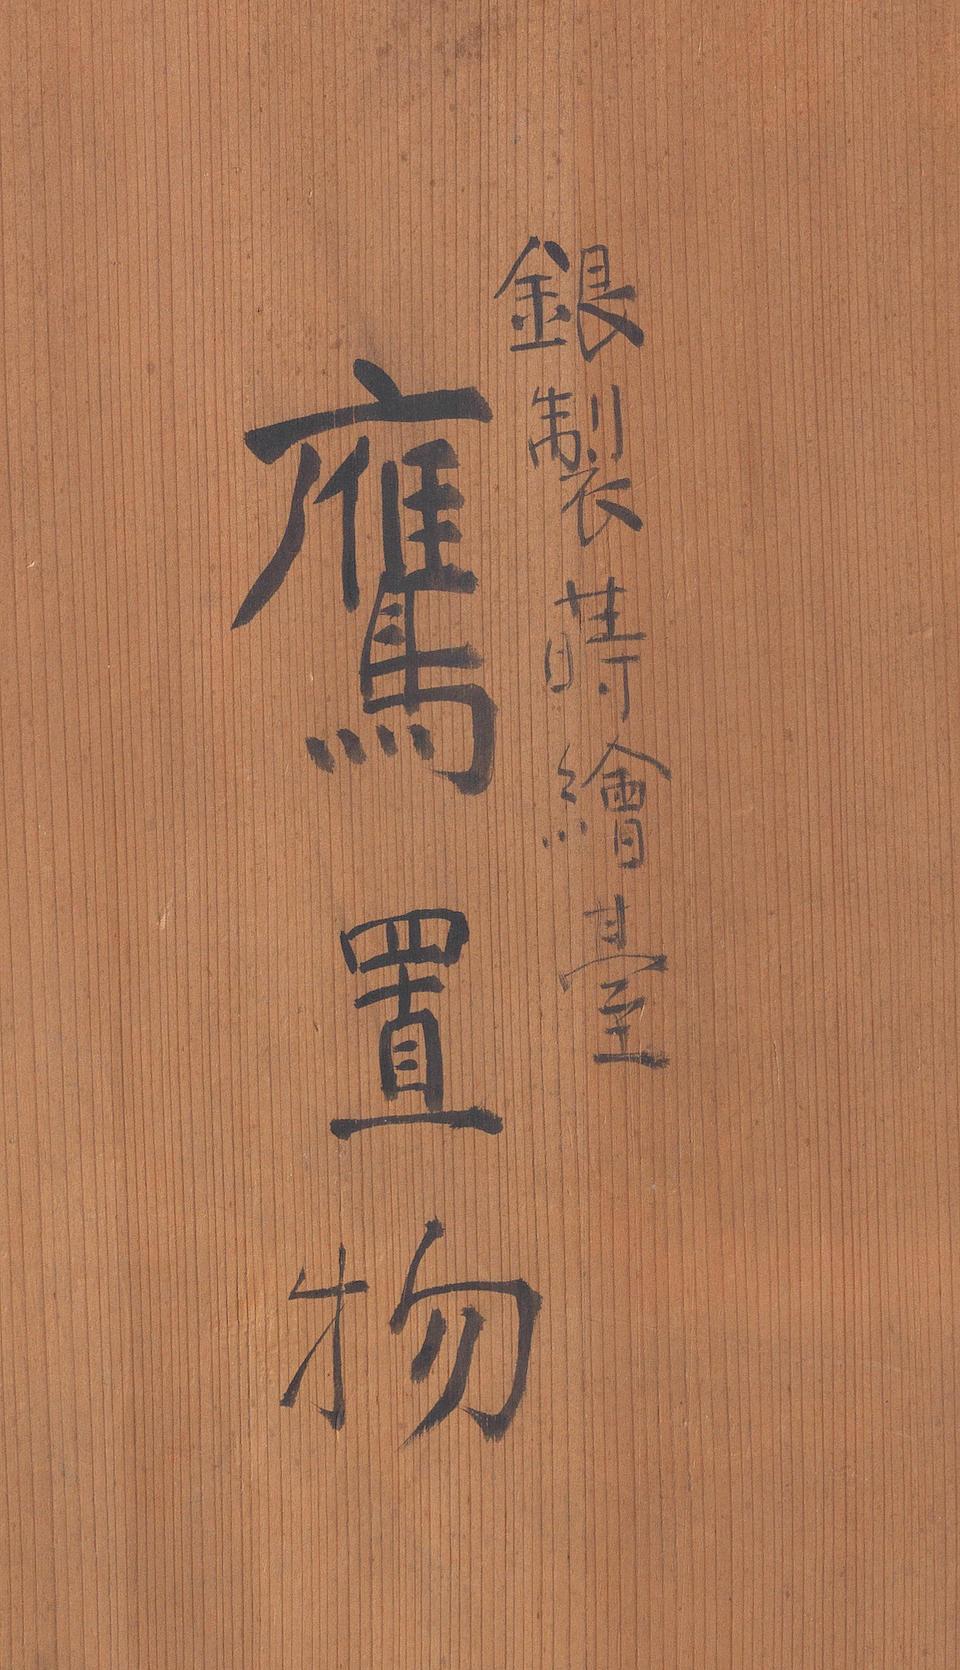 A silver okimono of a hawk on a black lacquer tall perch for the tokonoma (tea-room alcove) The hawk by Shoami Yoshihiro, the lacquer perch by Kanshosai Toyo II, Meiji Period